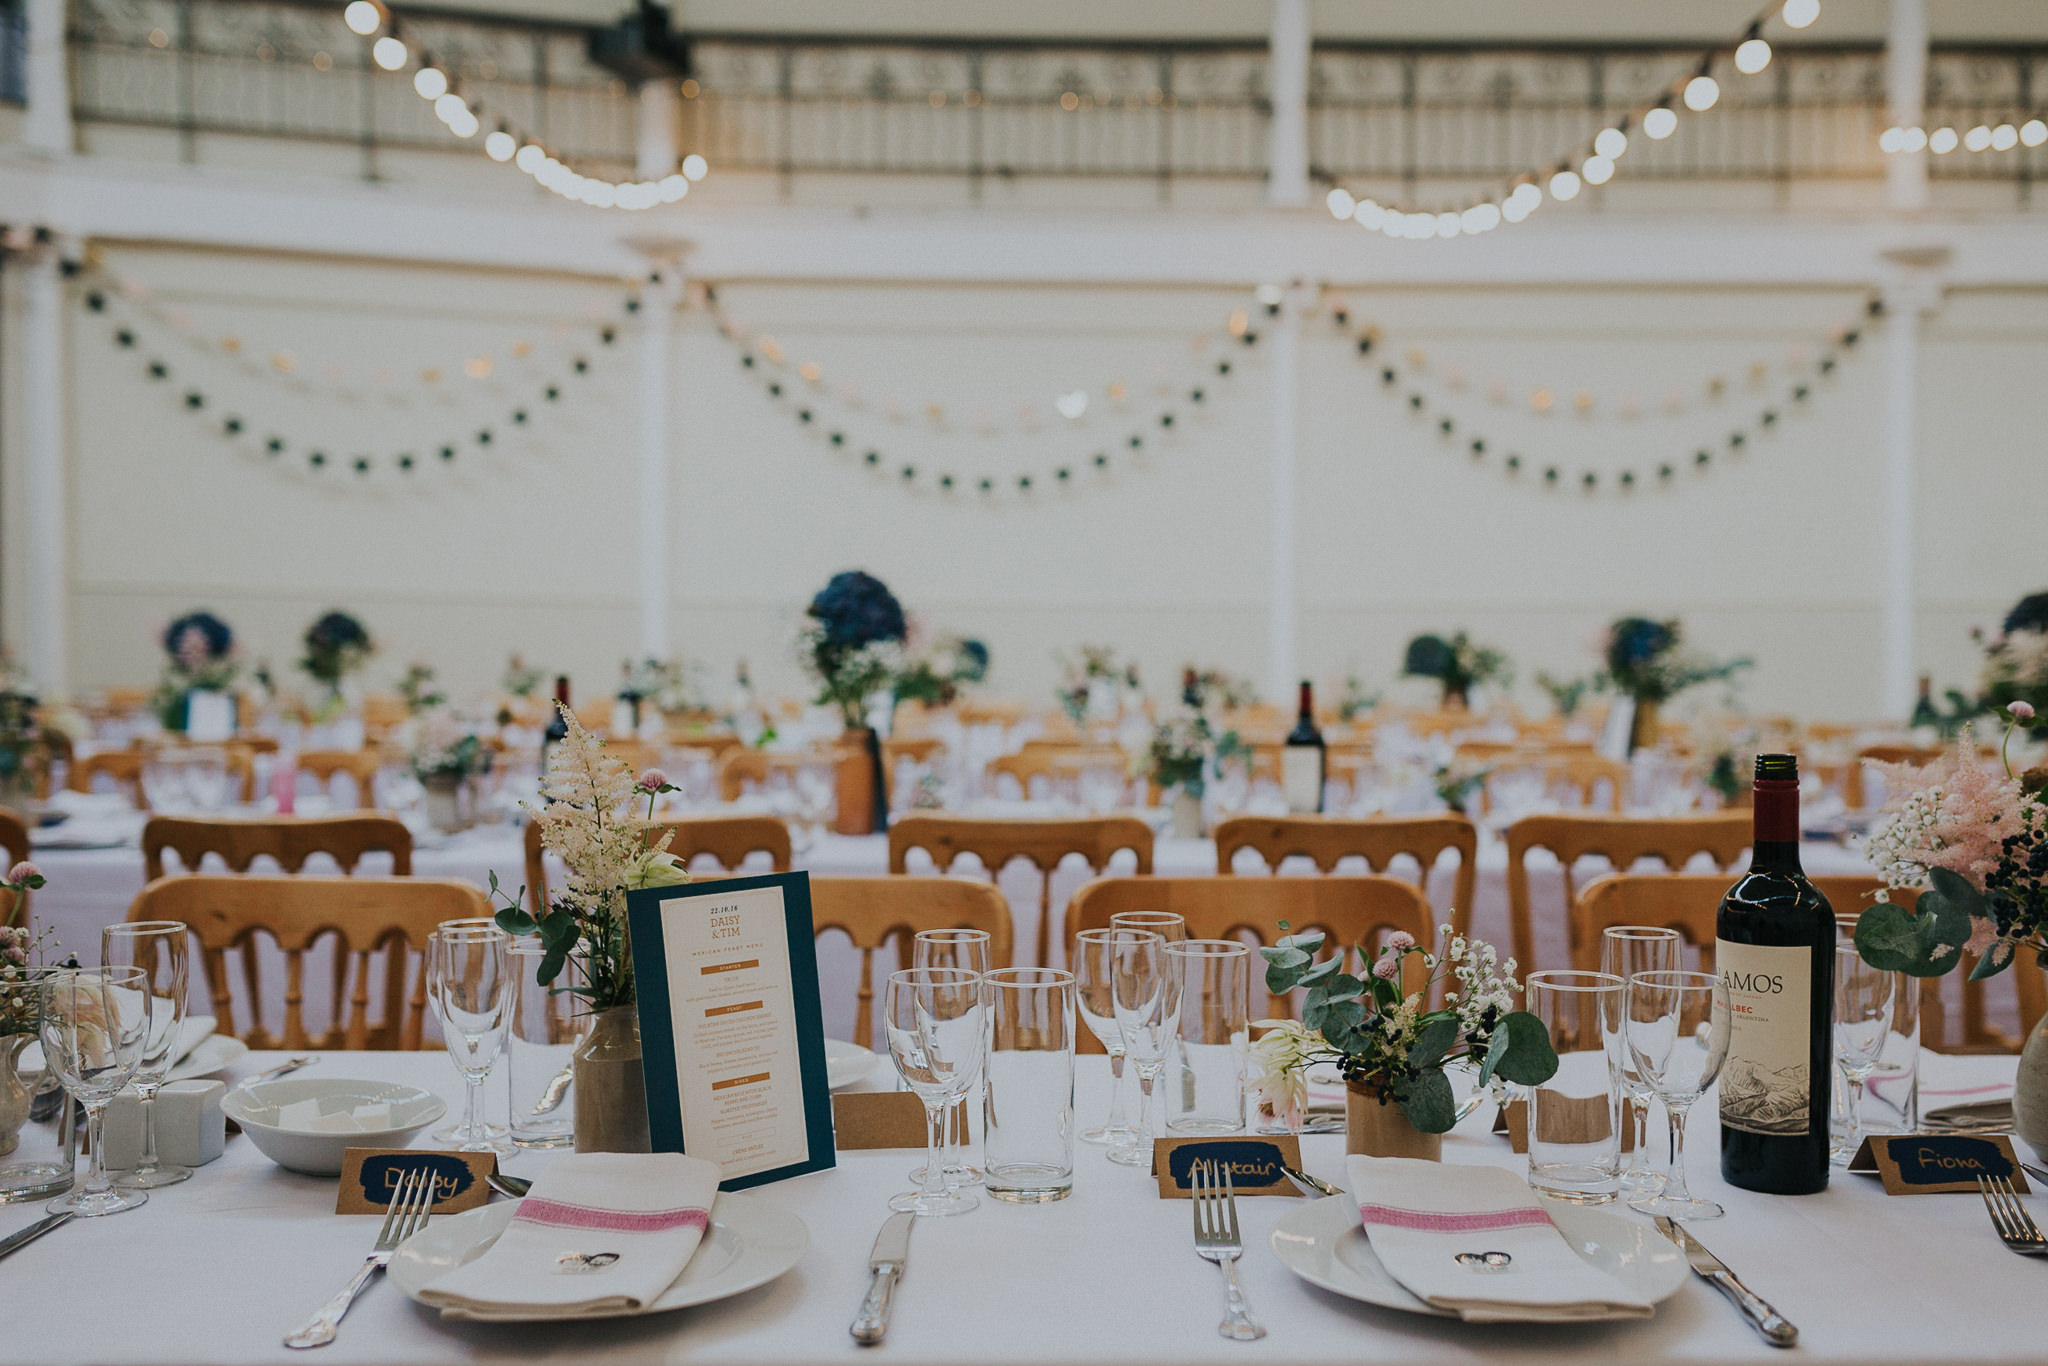 kate-gray-london-wedding-photography-44.jpg